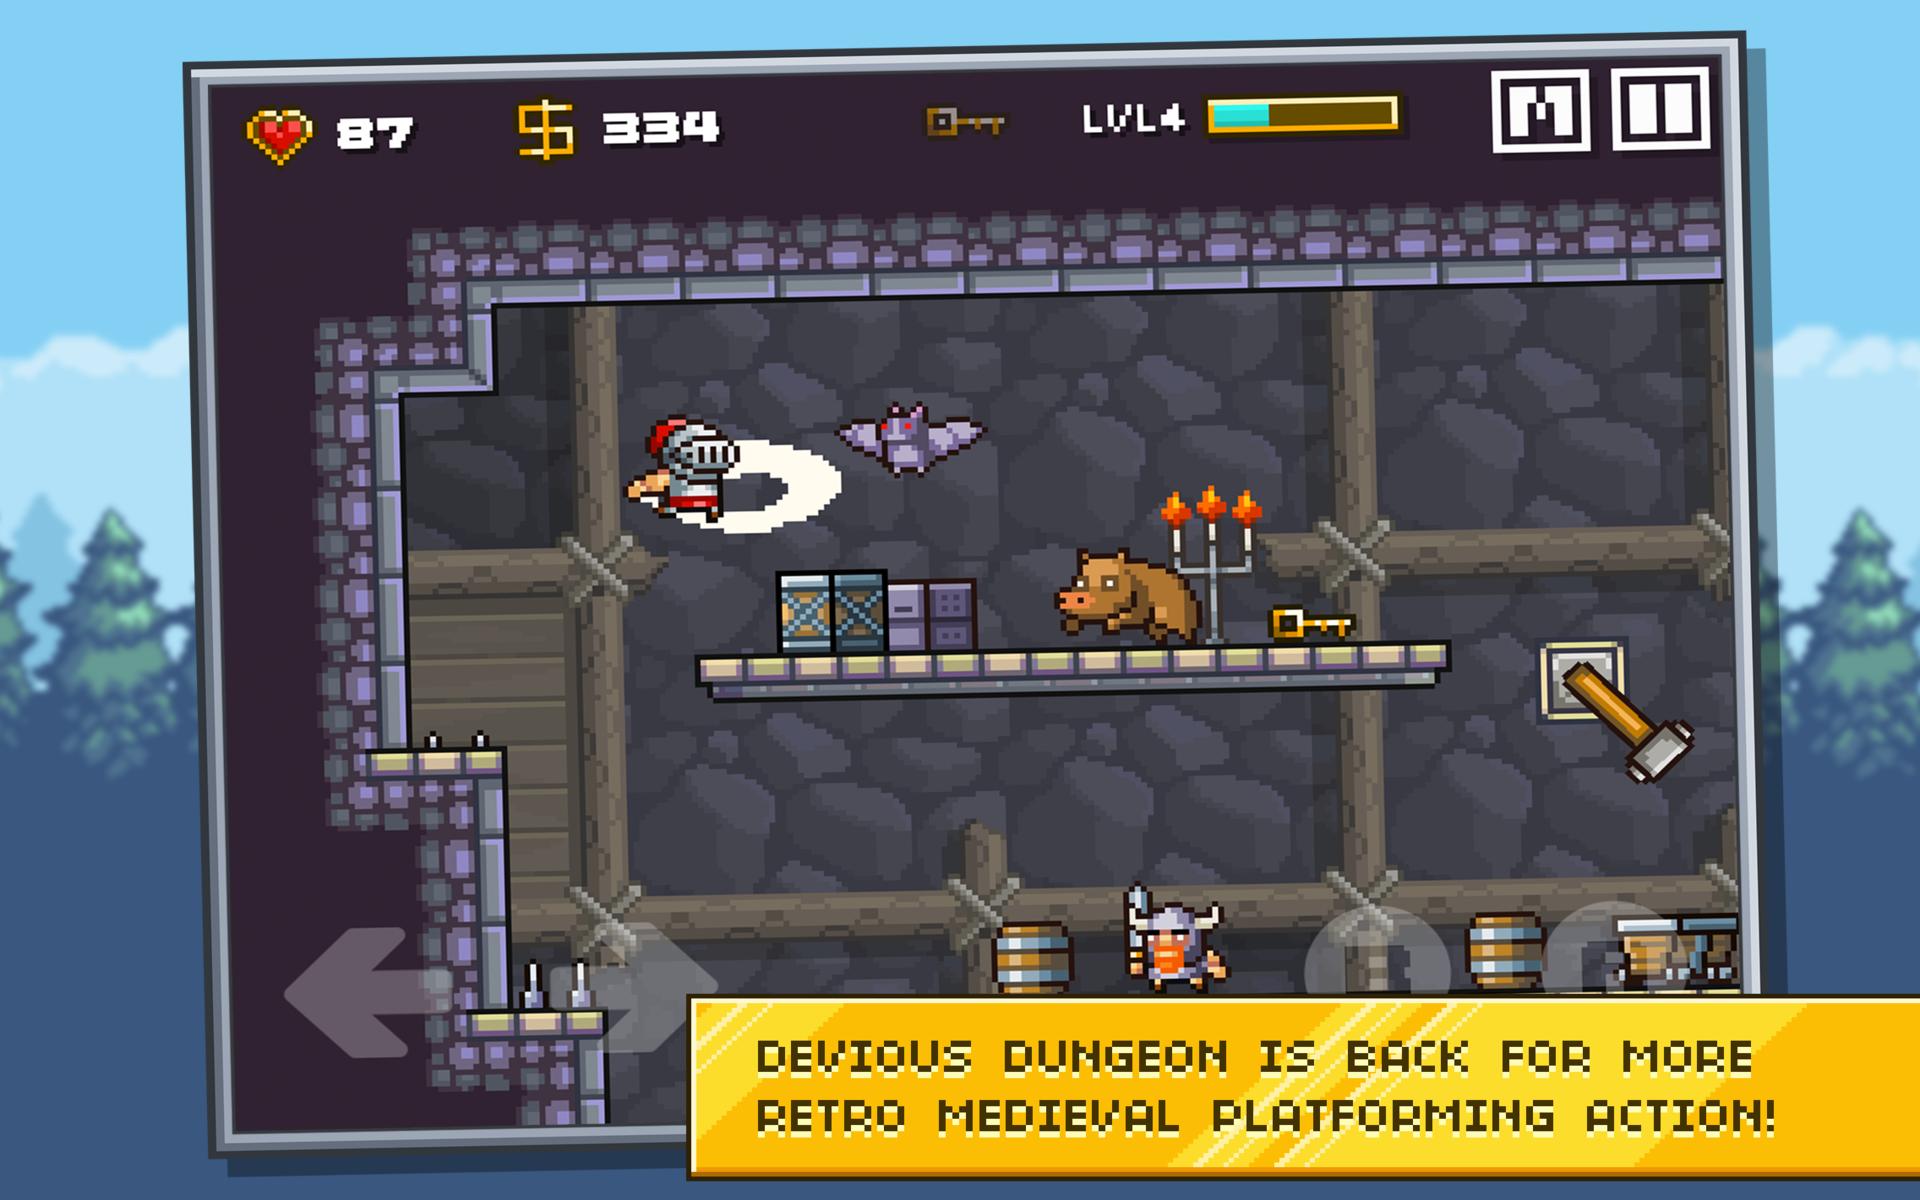 Devious Dungeon 2 screenshot #11